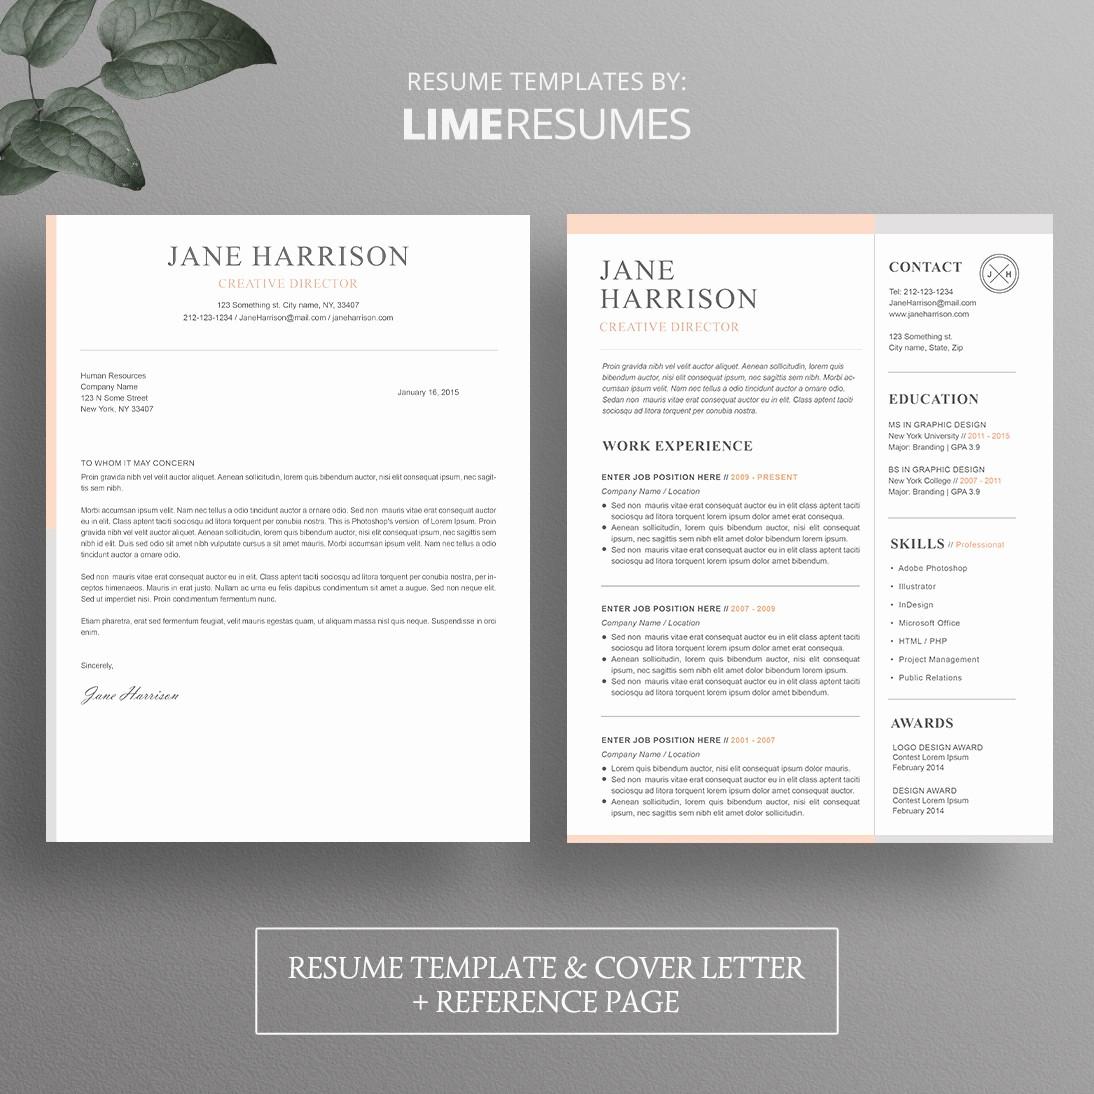 Microsoft Word Cover Letter Templates Unique Resume Template Cover Letter Template for Word